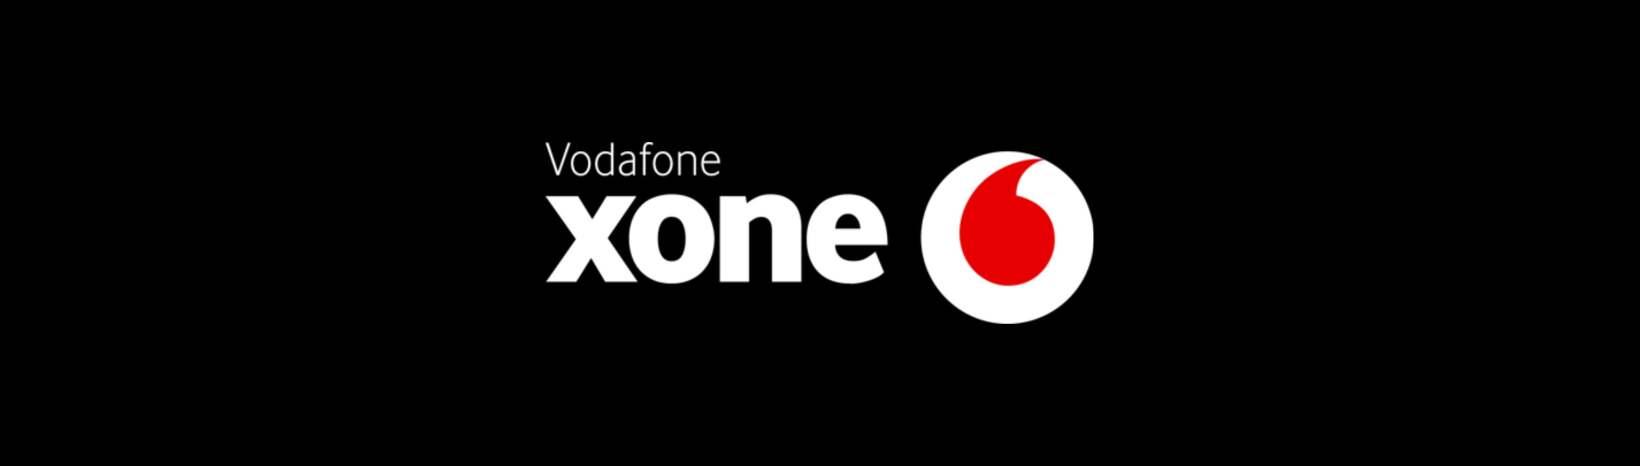 Vodafone xone welcomes 9 Kiwi innovators to accelerator programme